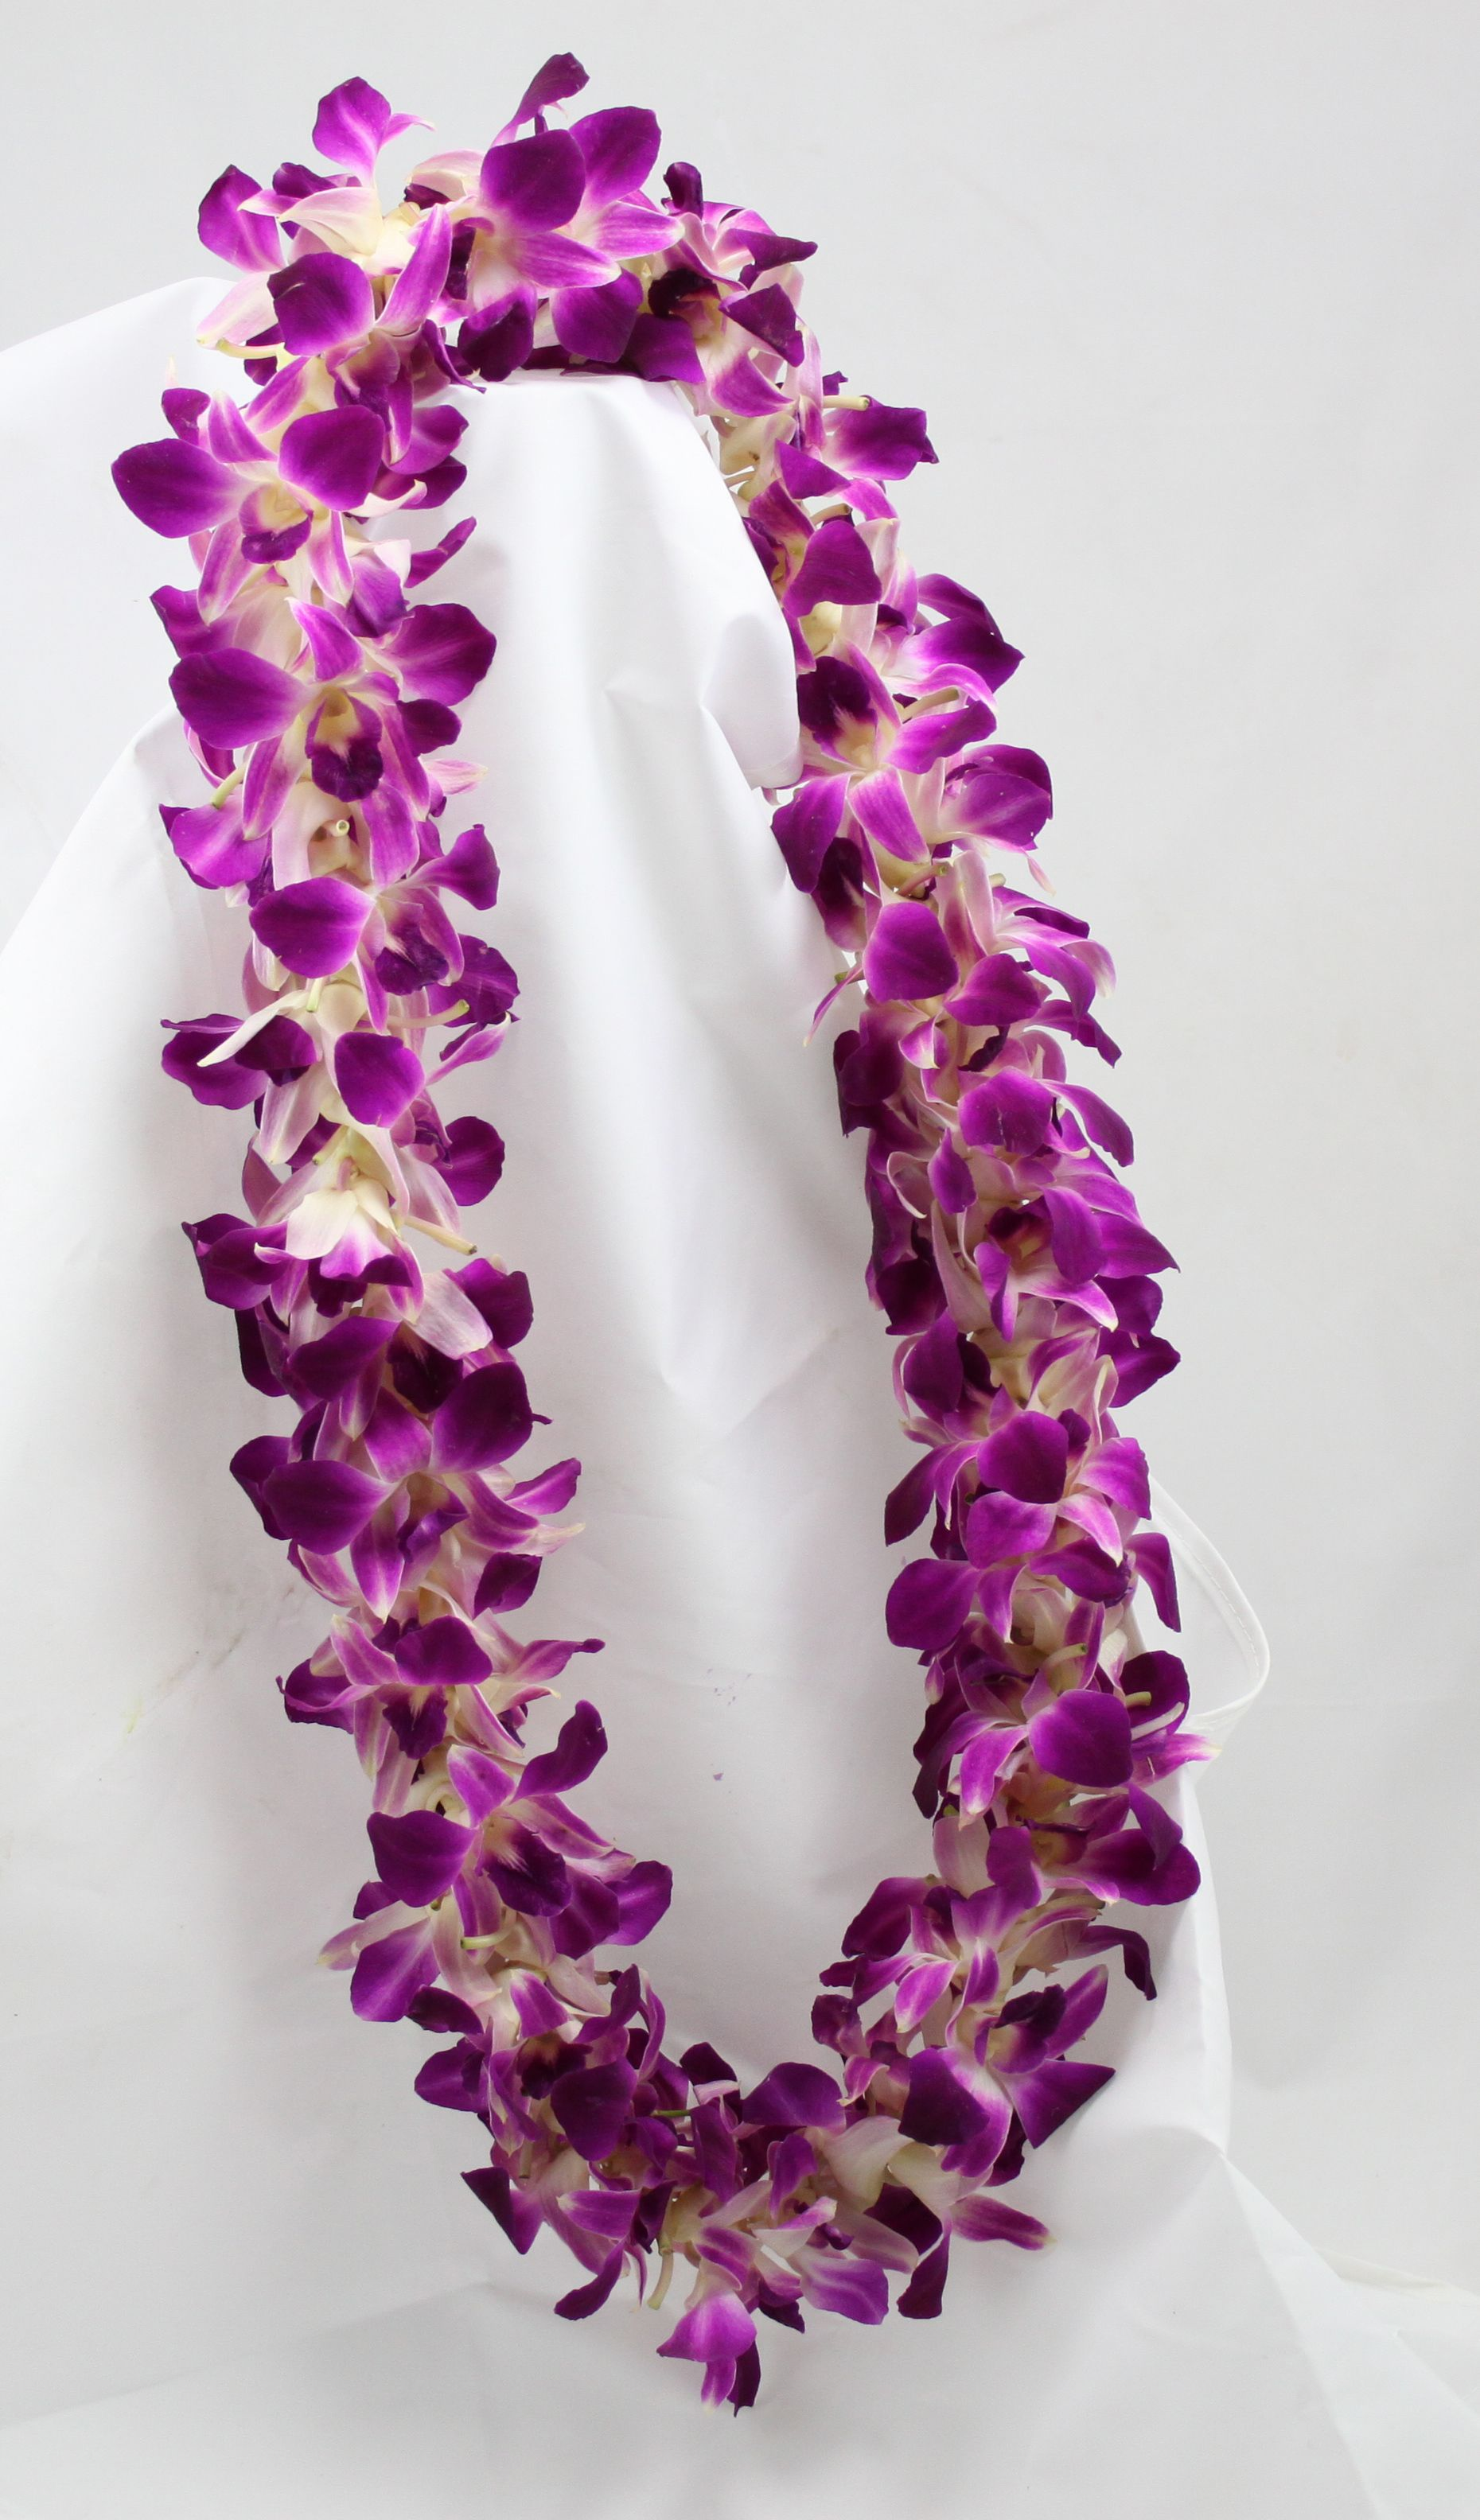 Dendrobium Orchid Leis Dendrobium Orchids Plumeria Flowers Orchid Lei